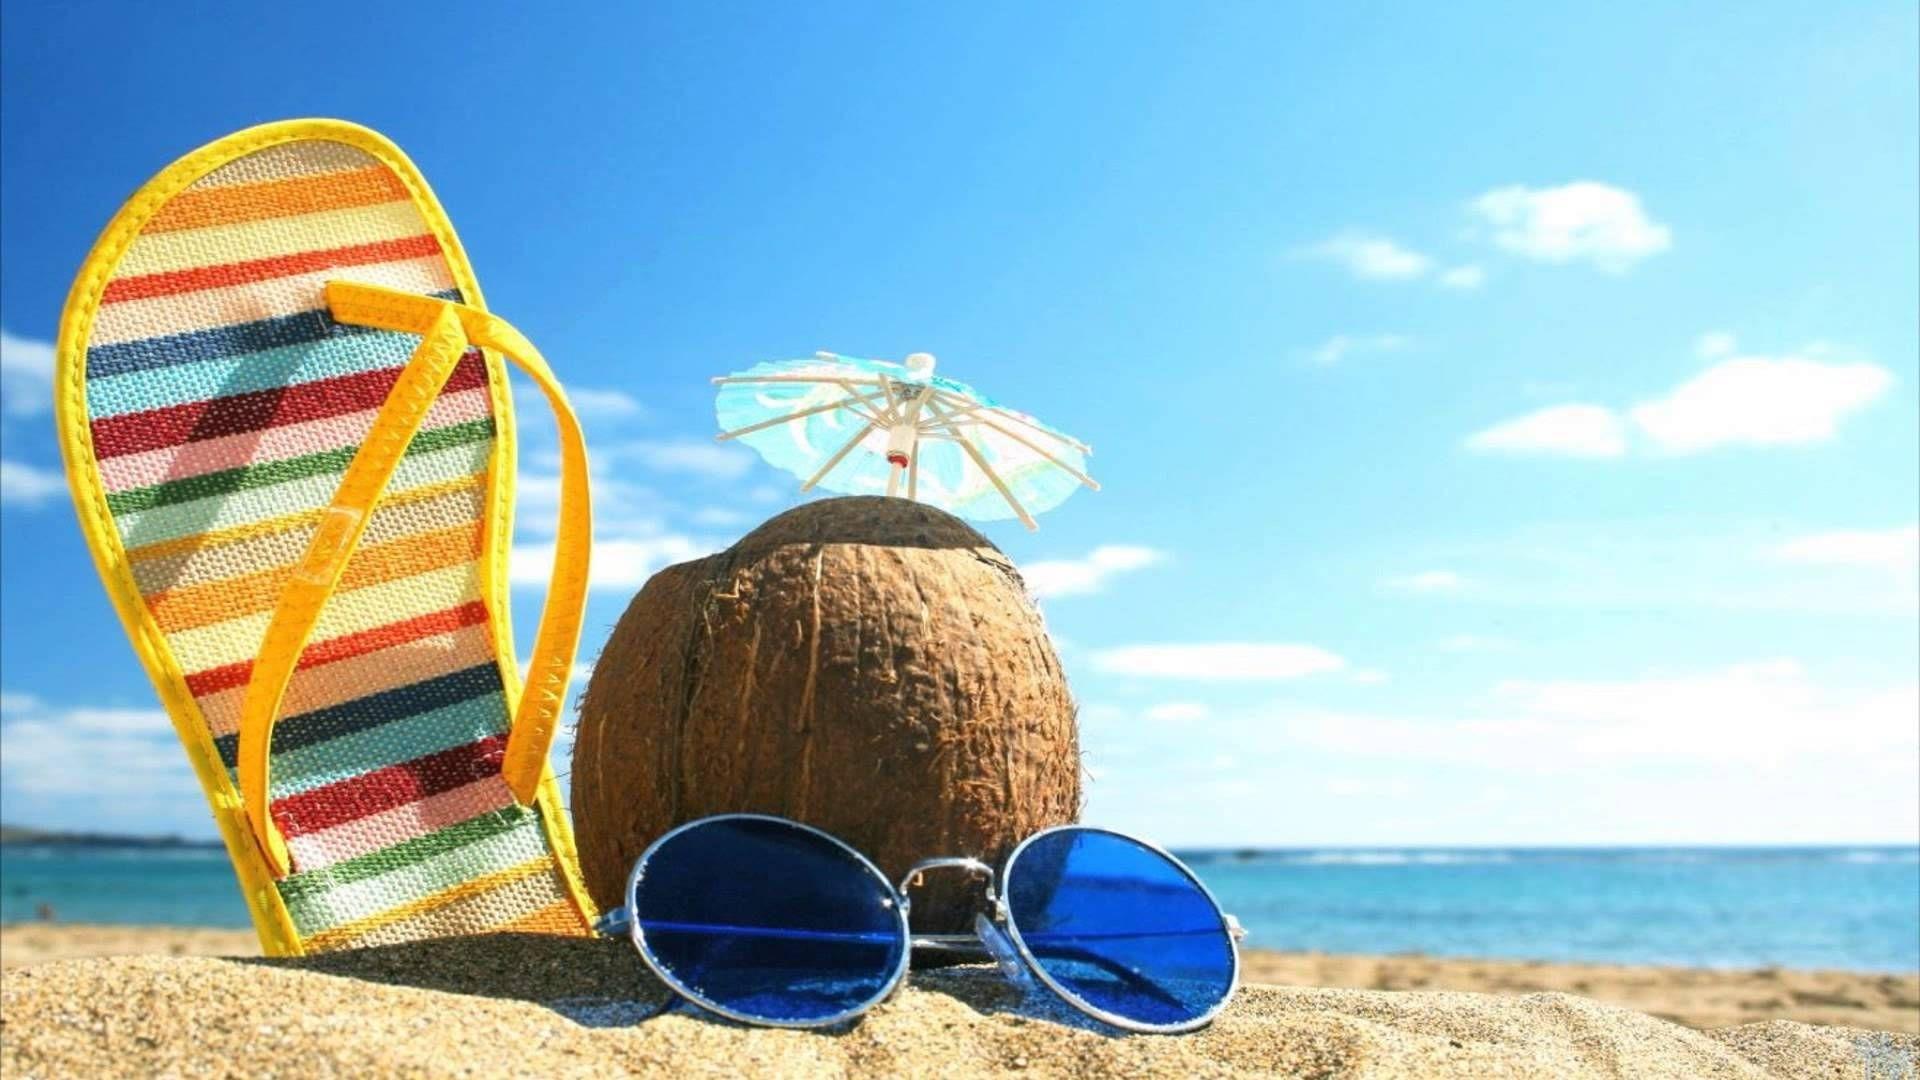 beach scenes | summer beach scenes wallpaper hd | free hd wallpapers